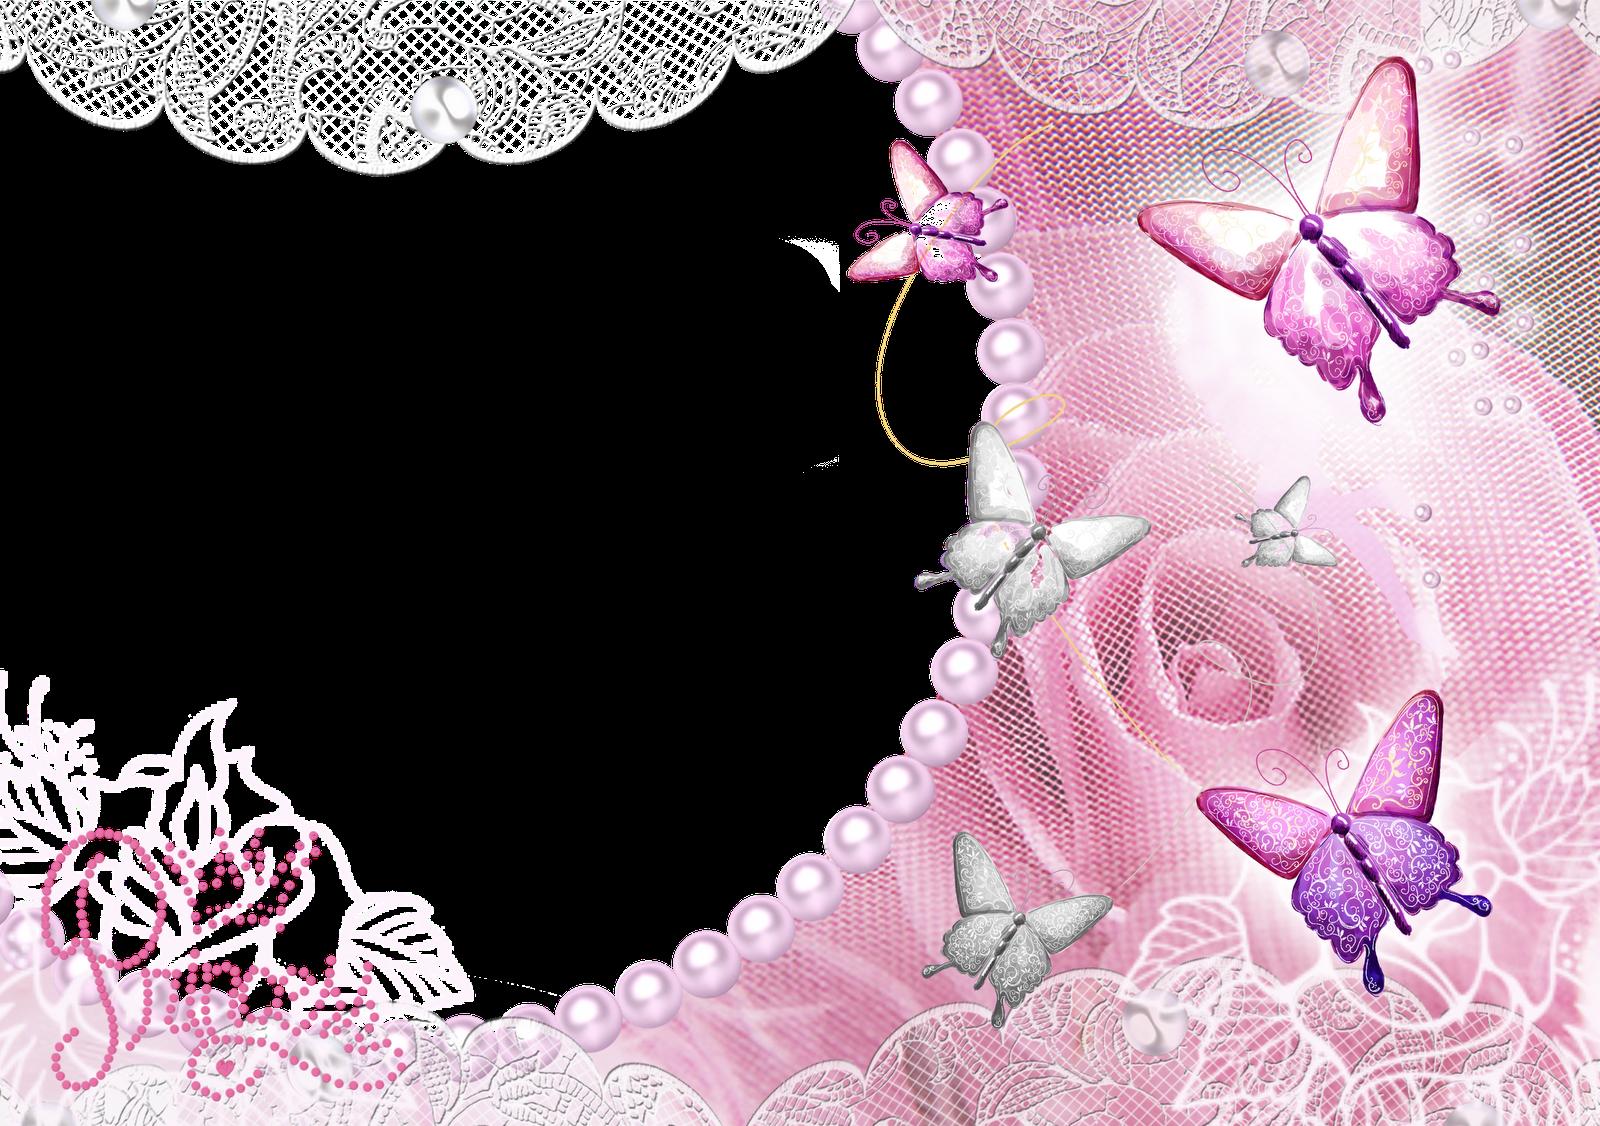 Descargar Gratis Marcos Con Flores - Descargar Marcos De Flores Para Fotos Gratis